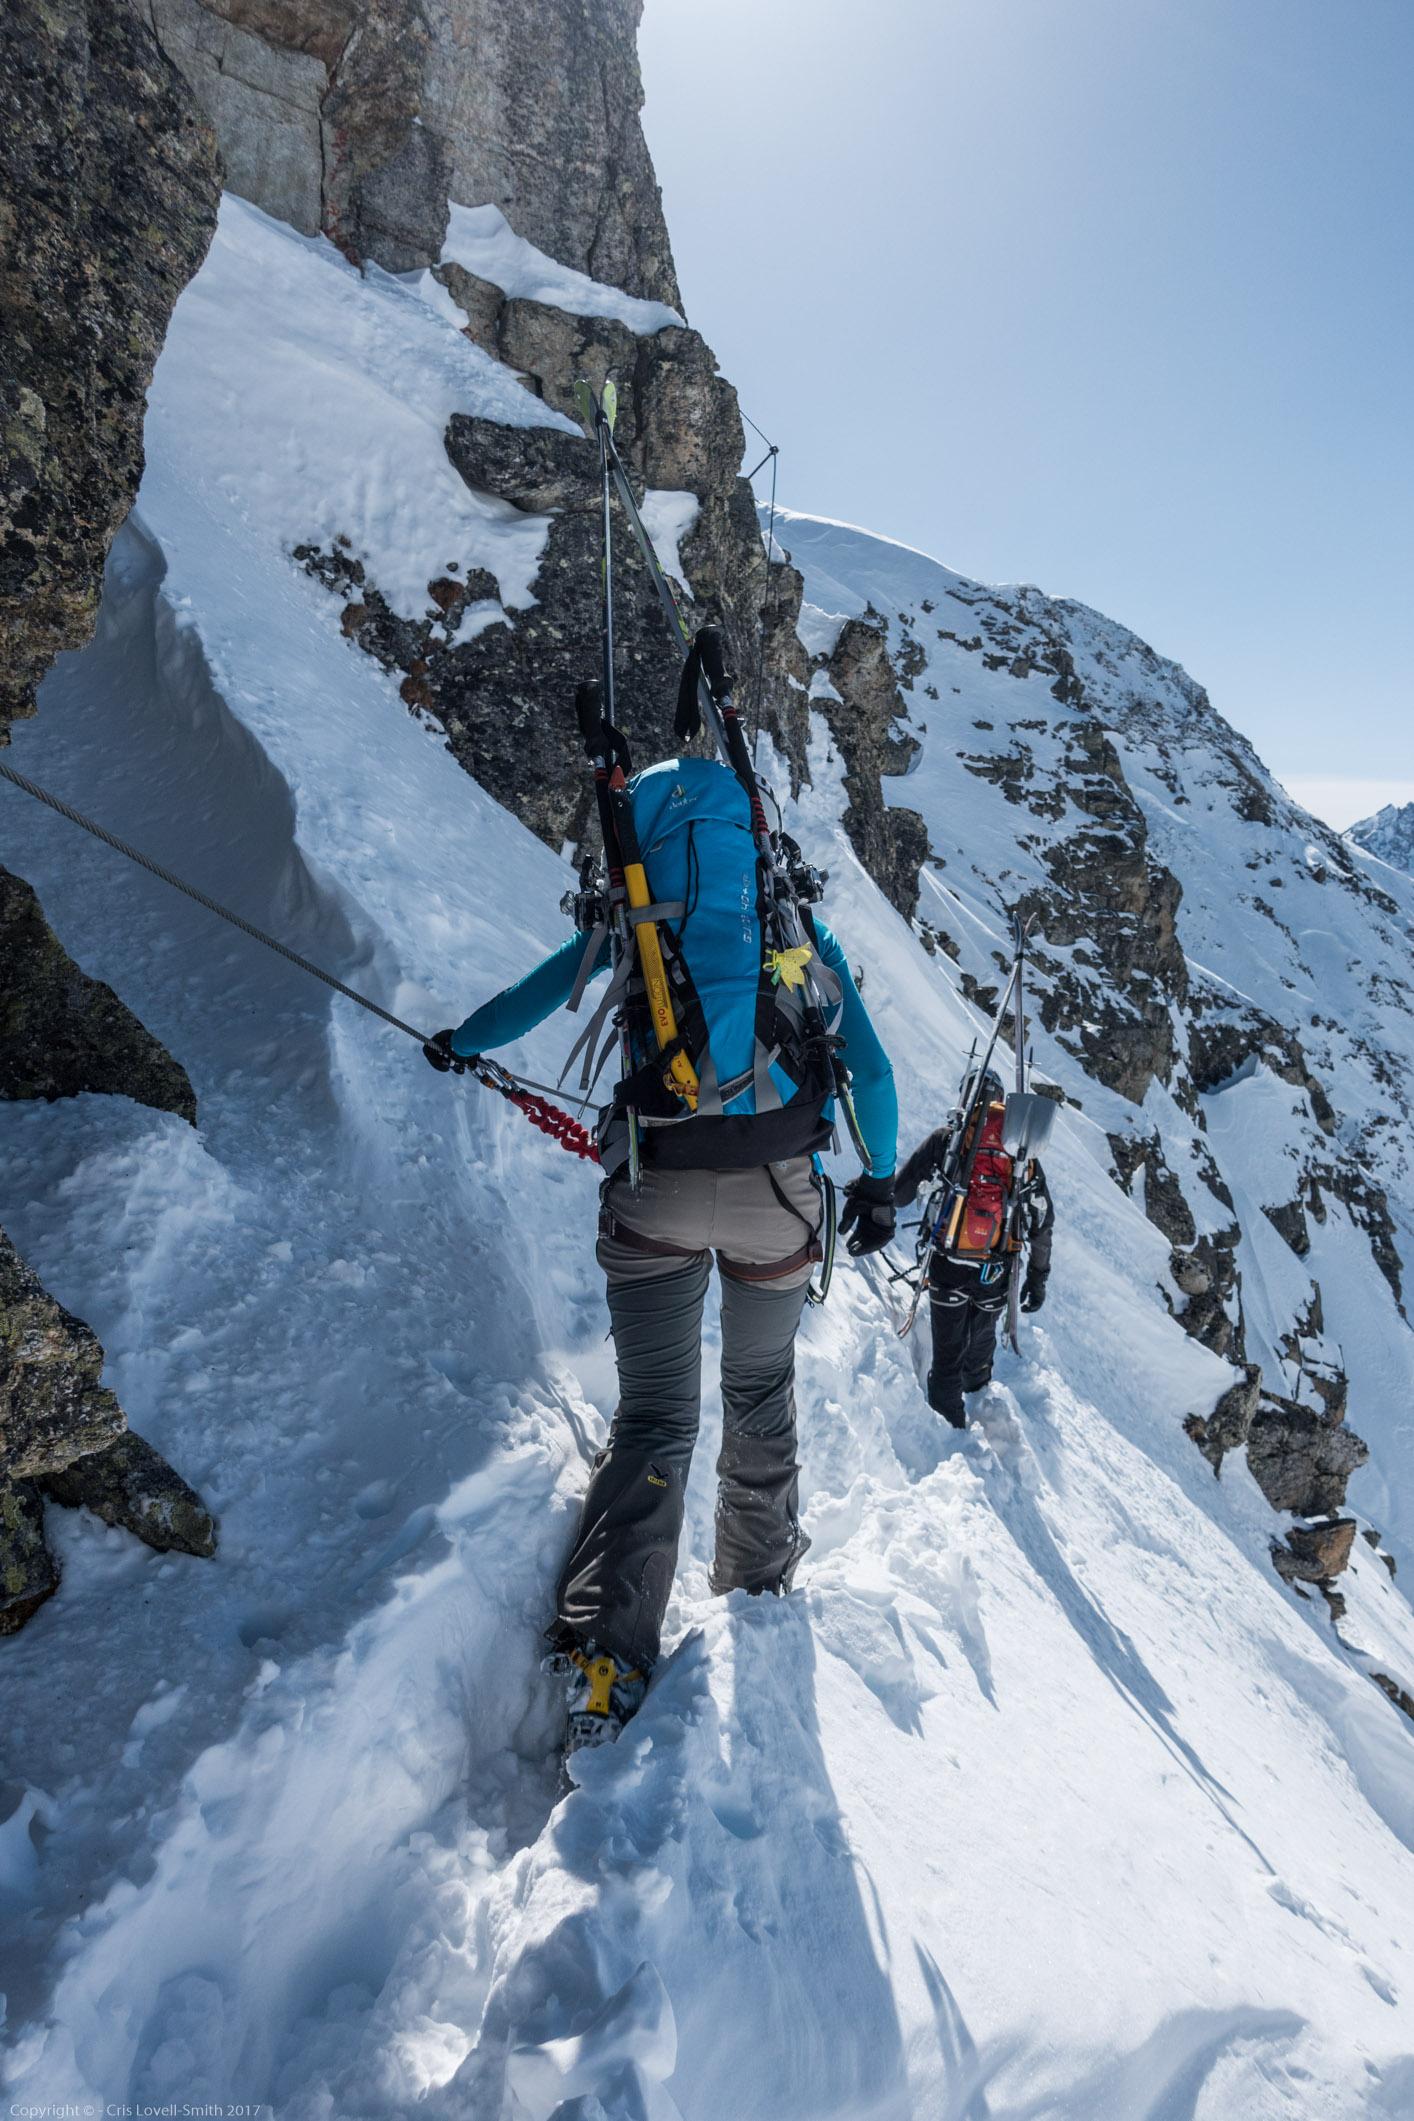 Lovely view (Arlberger Winterklettersteig March 2017)